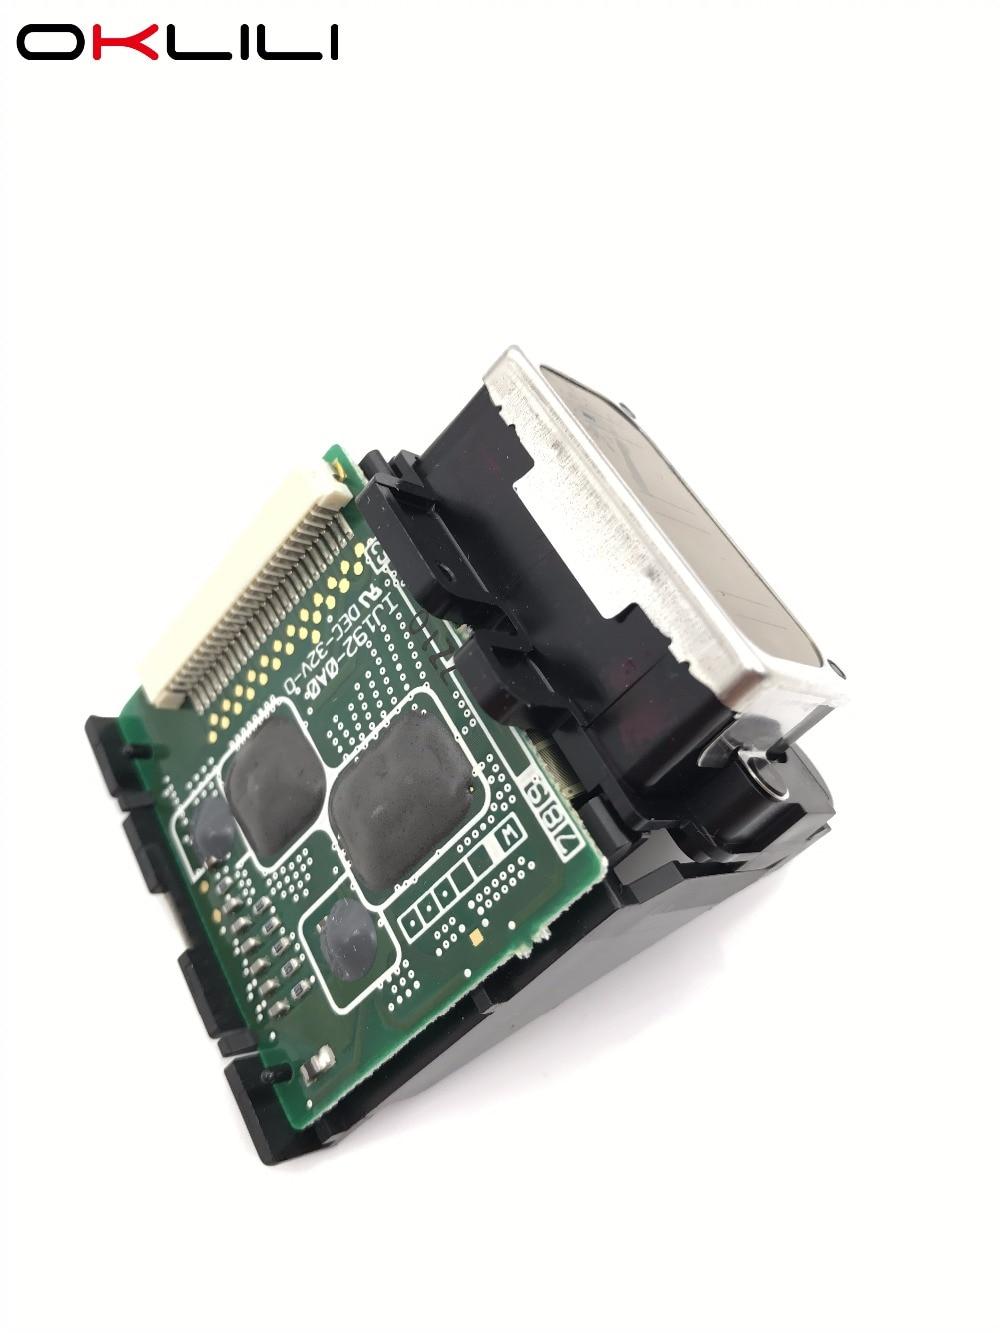 F055090 COLOR DX2 Solvent Printhead Print Head for Roland FJ-50 FJ-52 CJ-500 SC-500 SJ-500 SJ-600 For Mimaki JV2-130 JV2-90 TX1 new and original dx4 printhead eco solvent dx4 print head for epson roland vp 540 for mimaki jv2 jv4 printer